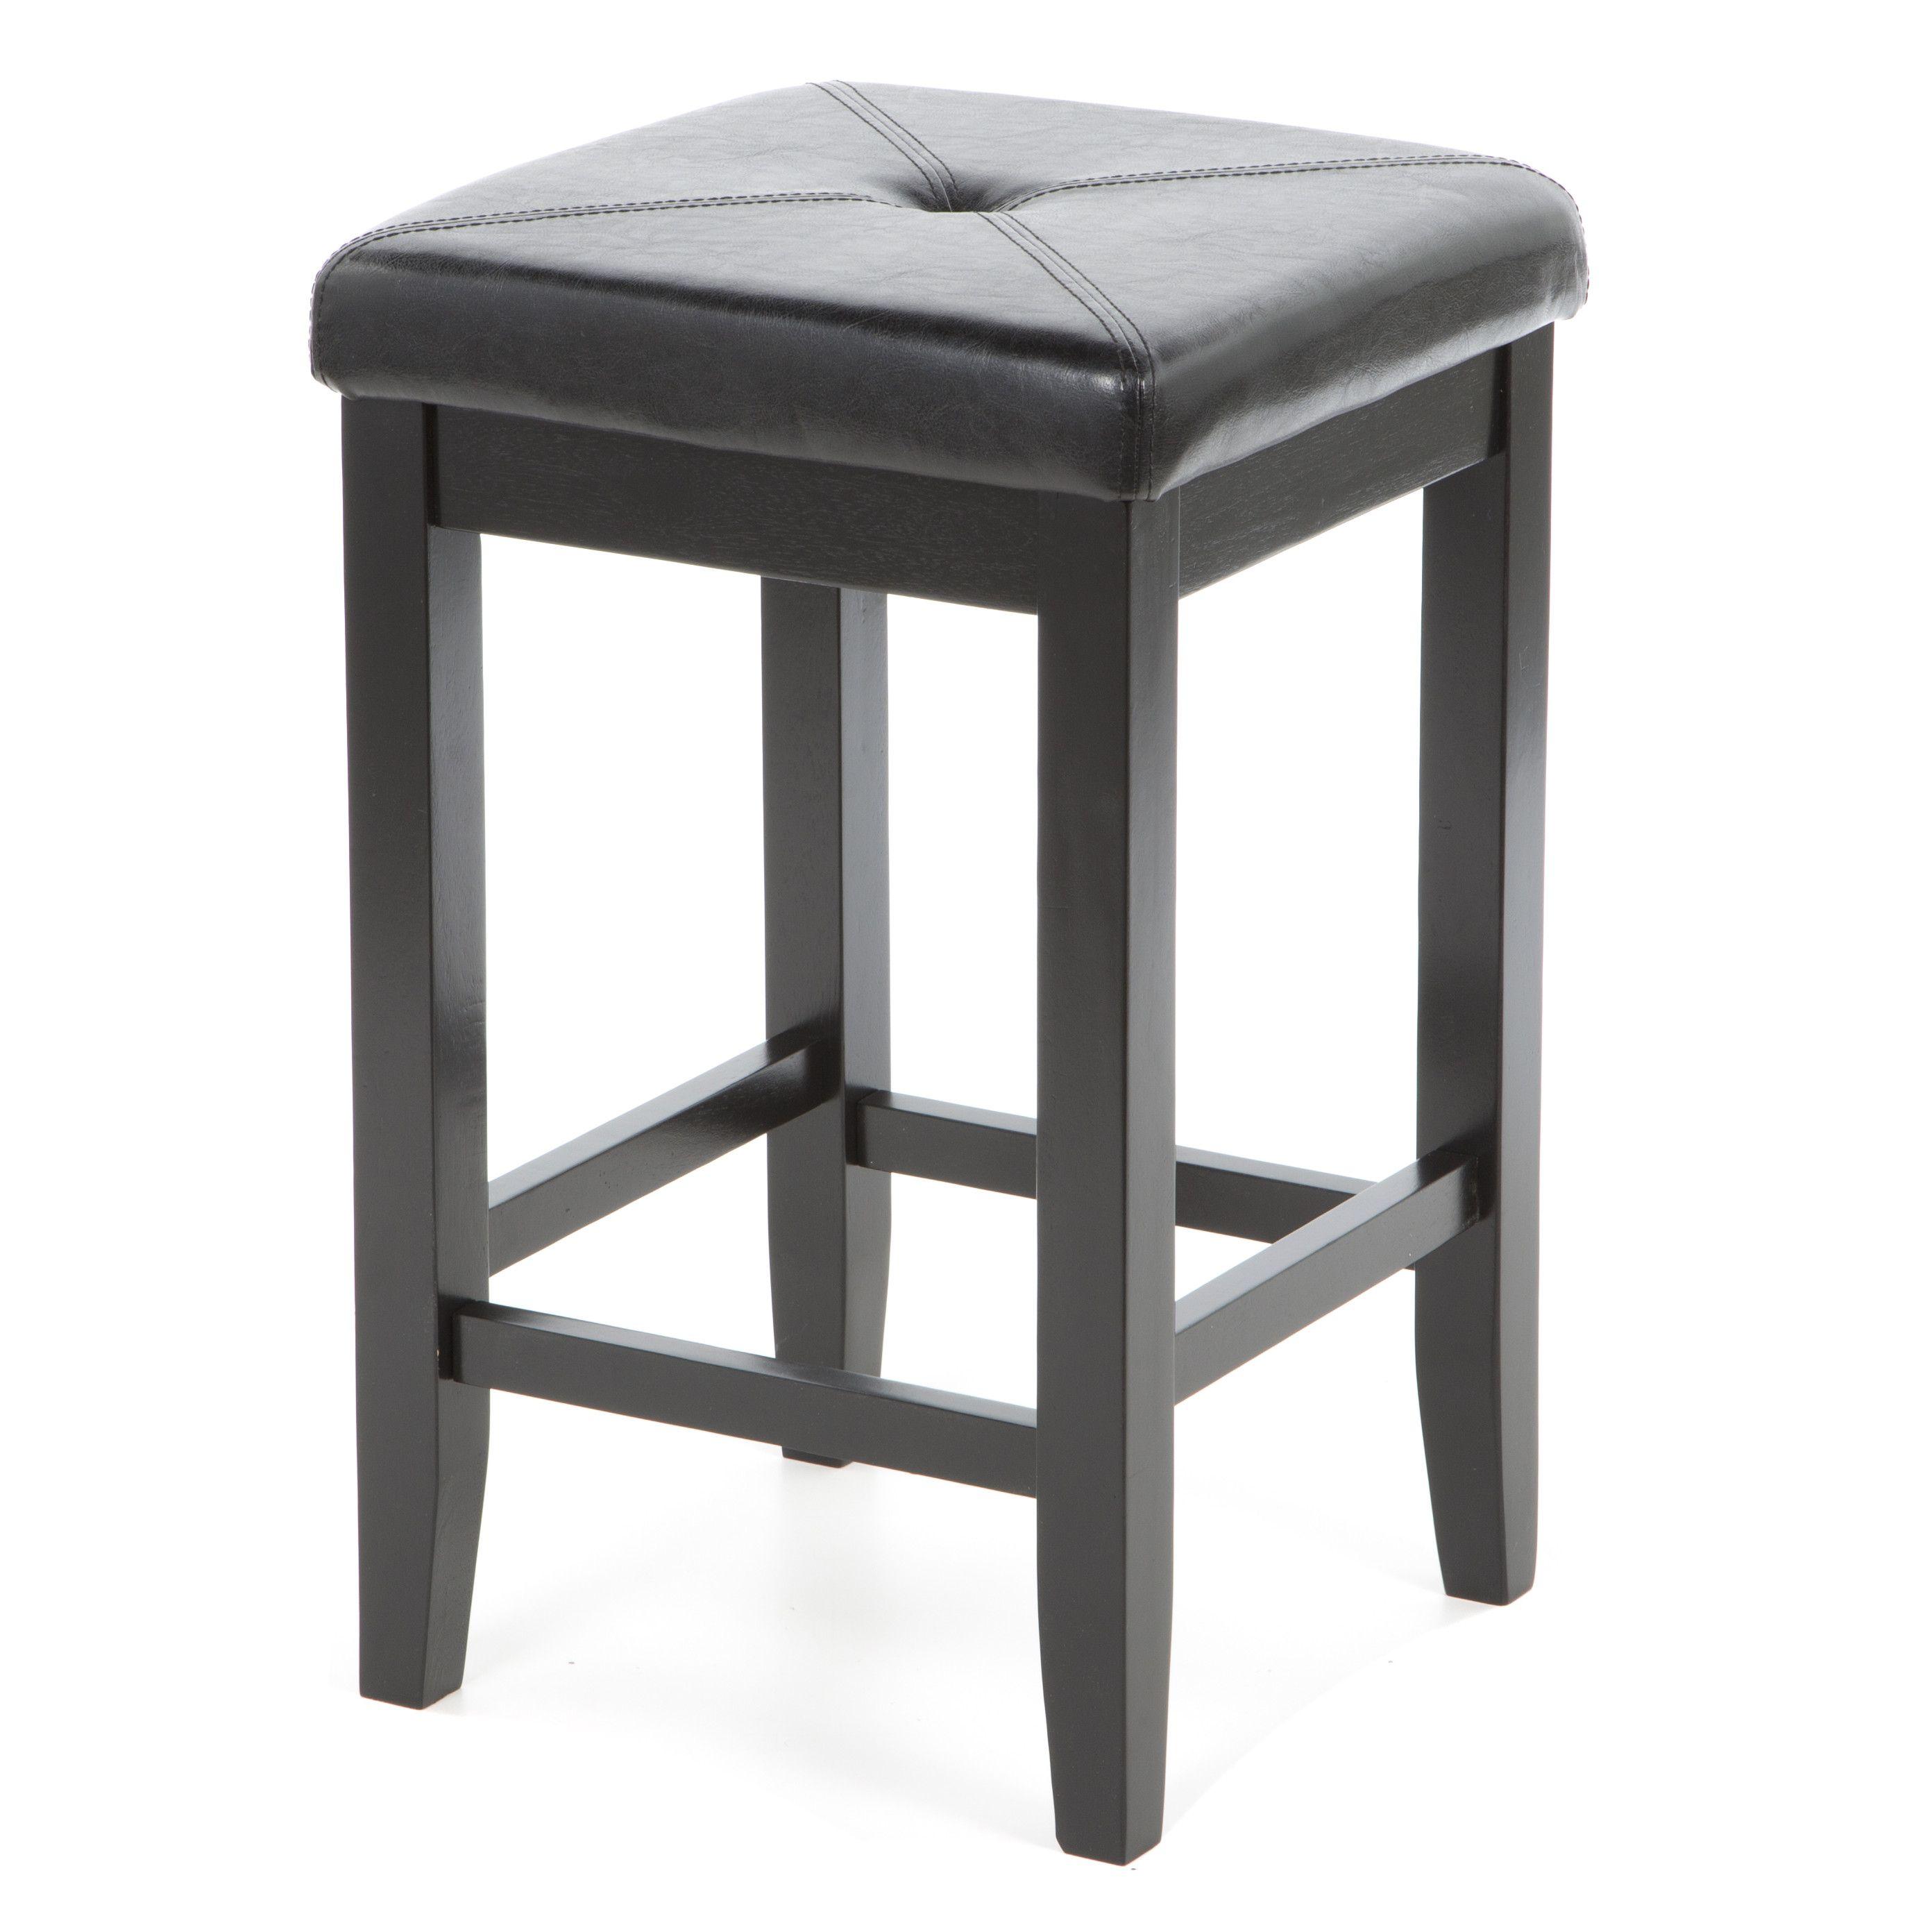 Theke Hohe Barhocker Wayfair Kuche Tisch Und Stuhle Hocker Metall